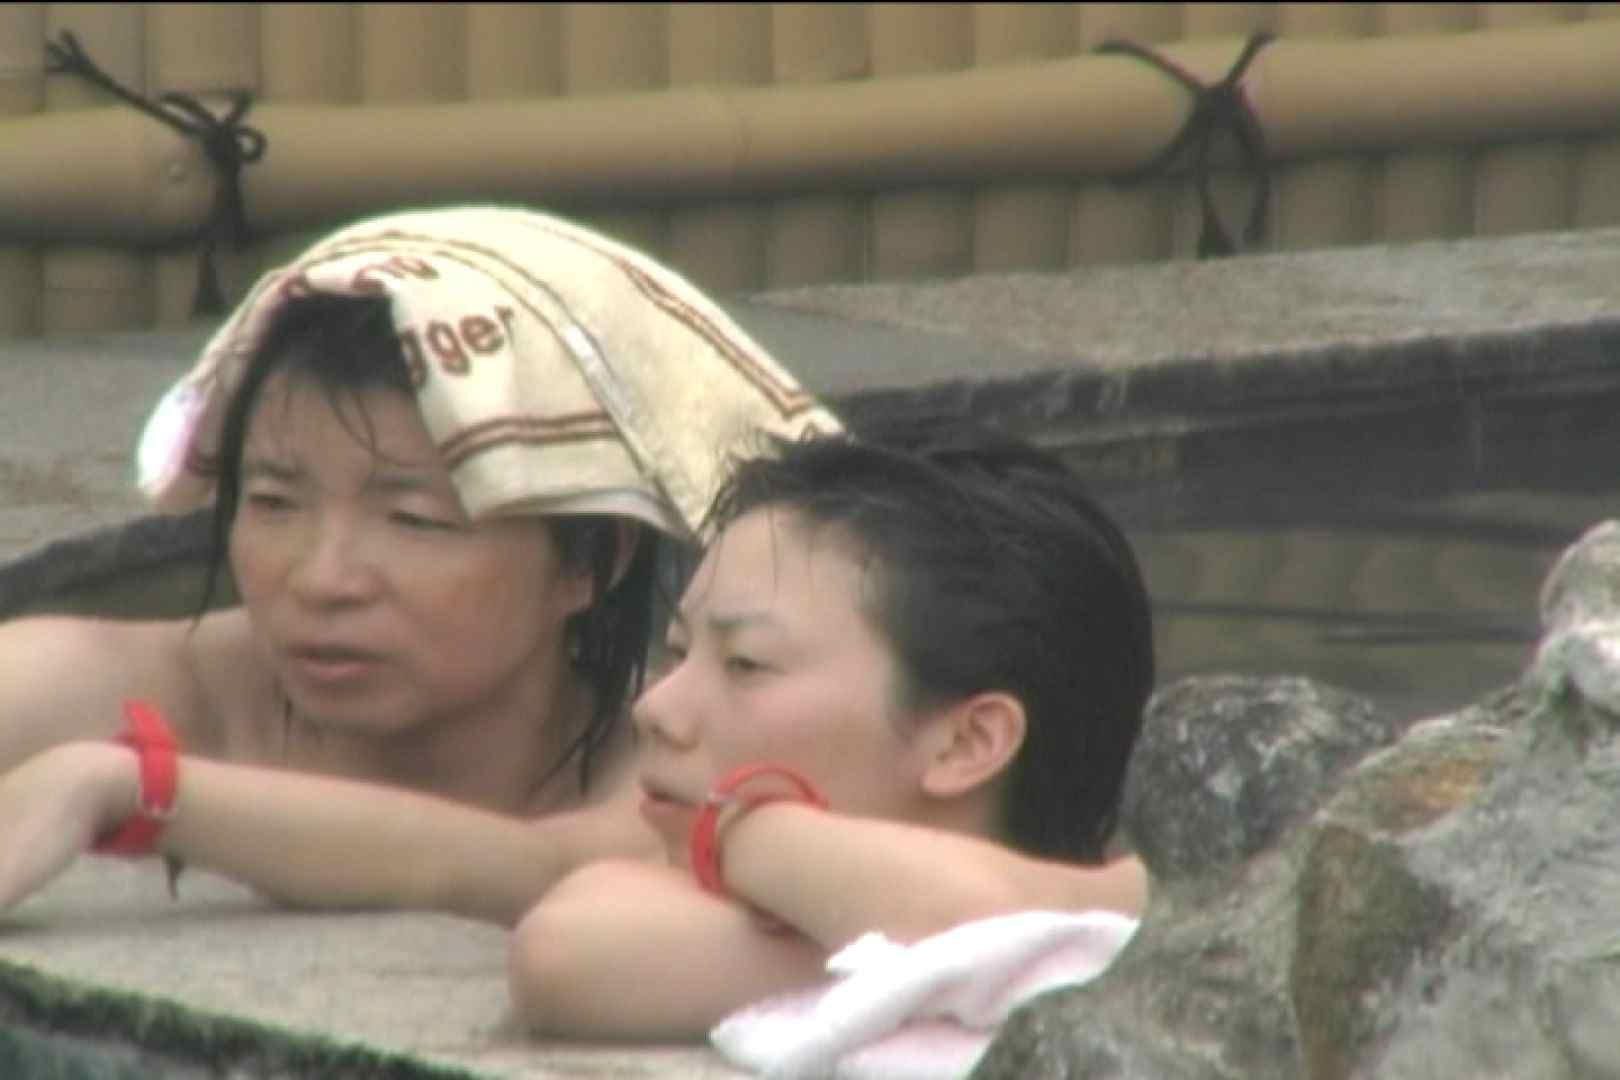 Aquaな露天風呂Vol.122 エッチな盗撮 オメコ無修正動画無料 107pic 26